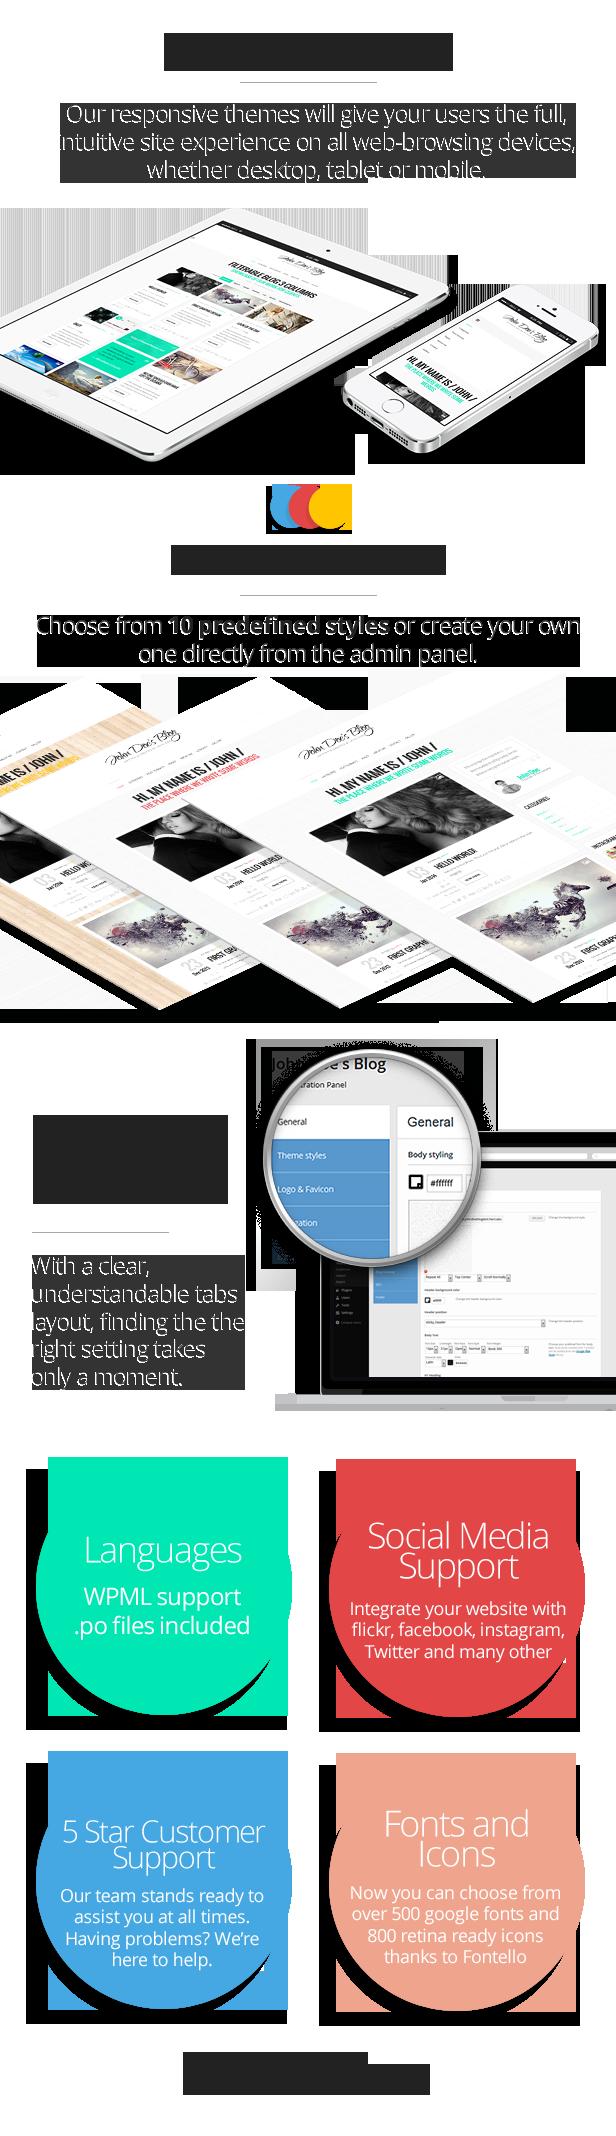 John Does Blog - sauberes Wordpress-Blog-Layout